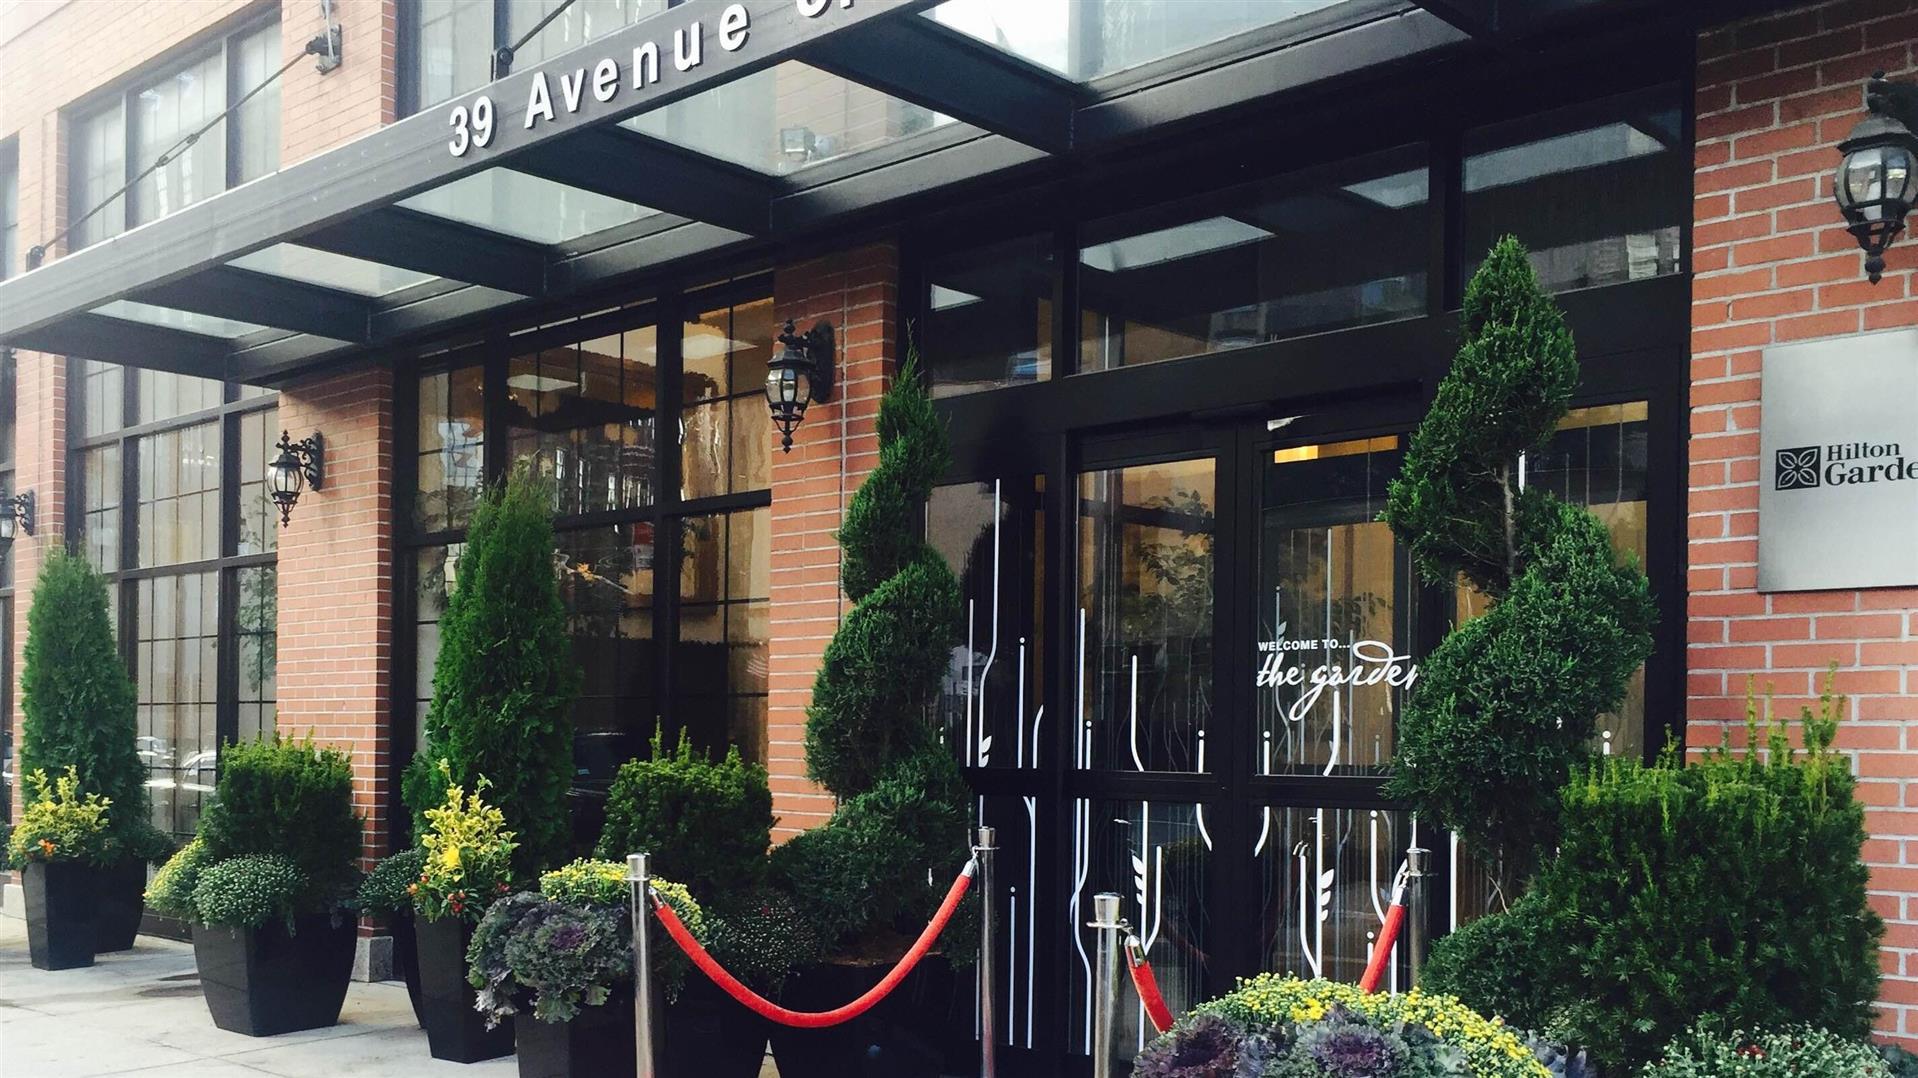 Meetings And Events At Hilton Garden Inn New York/Tribeca, New York, NY, US